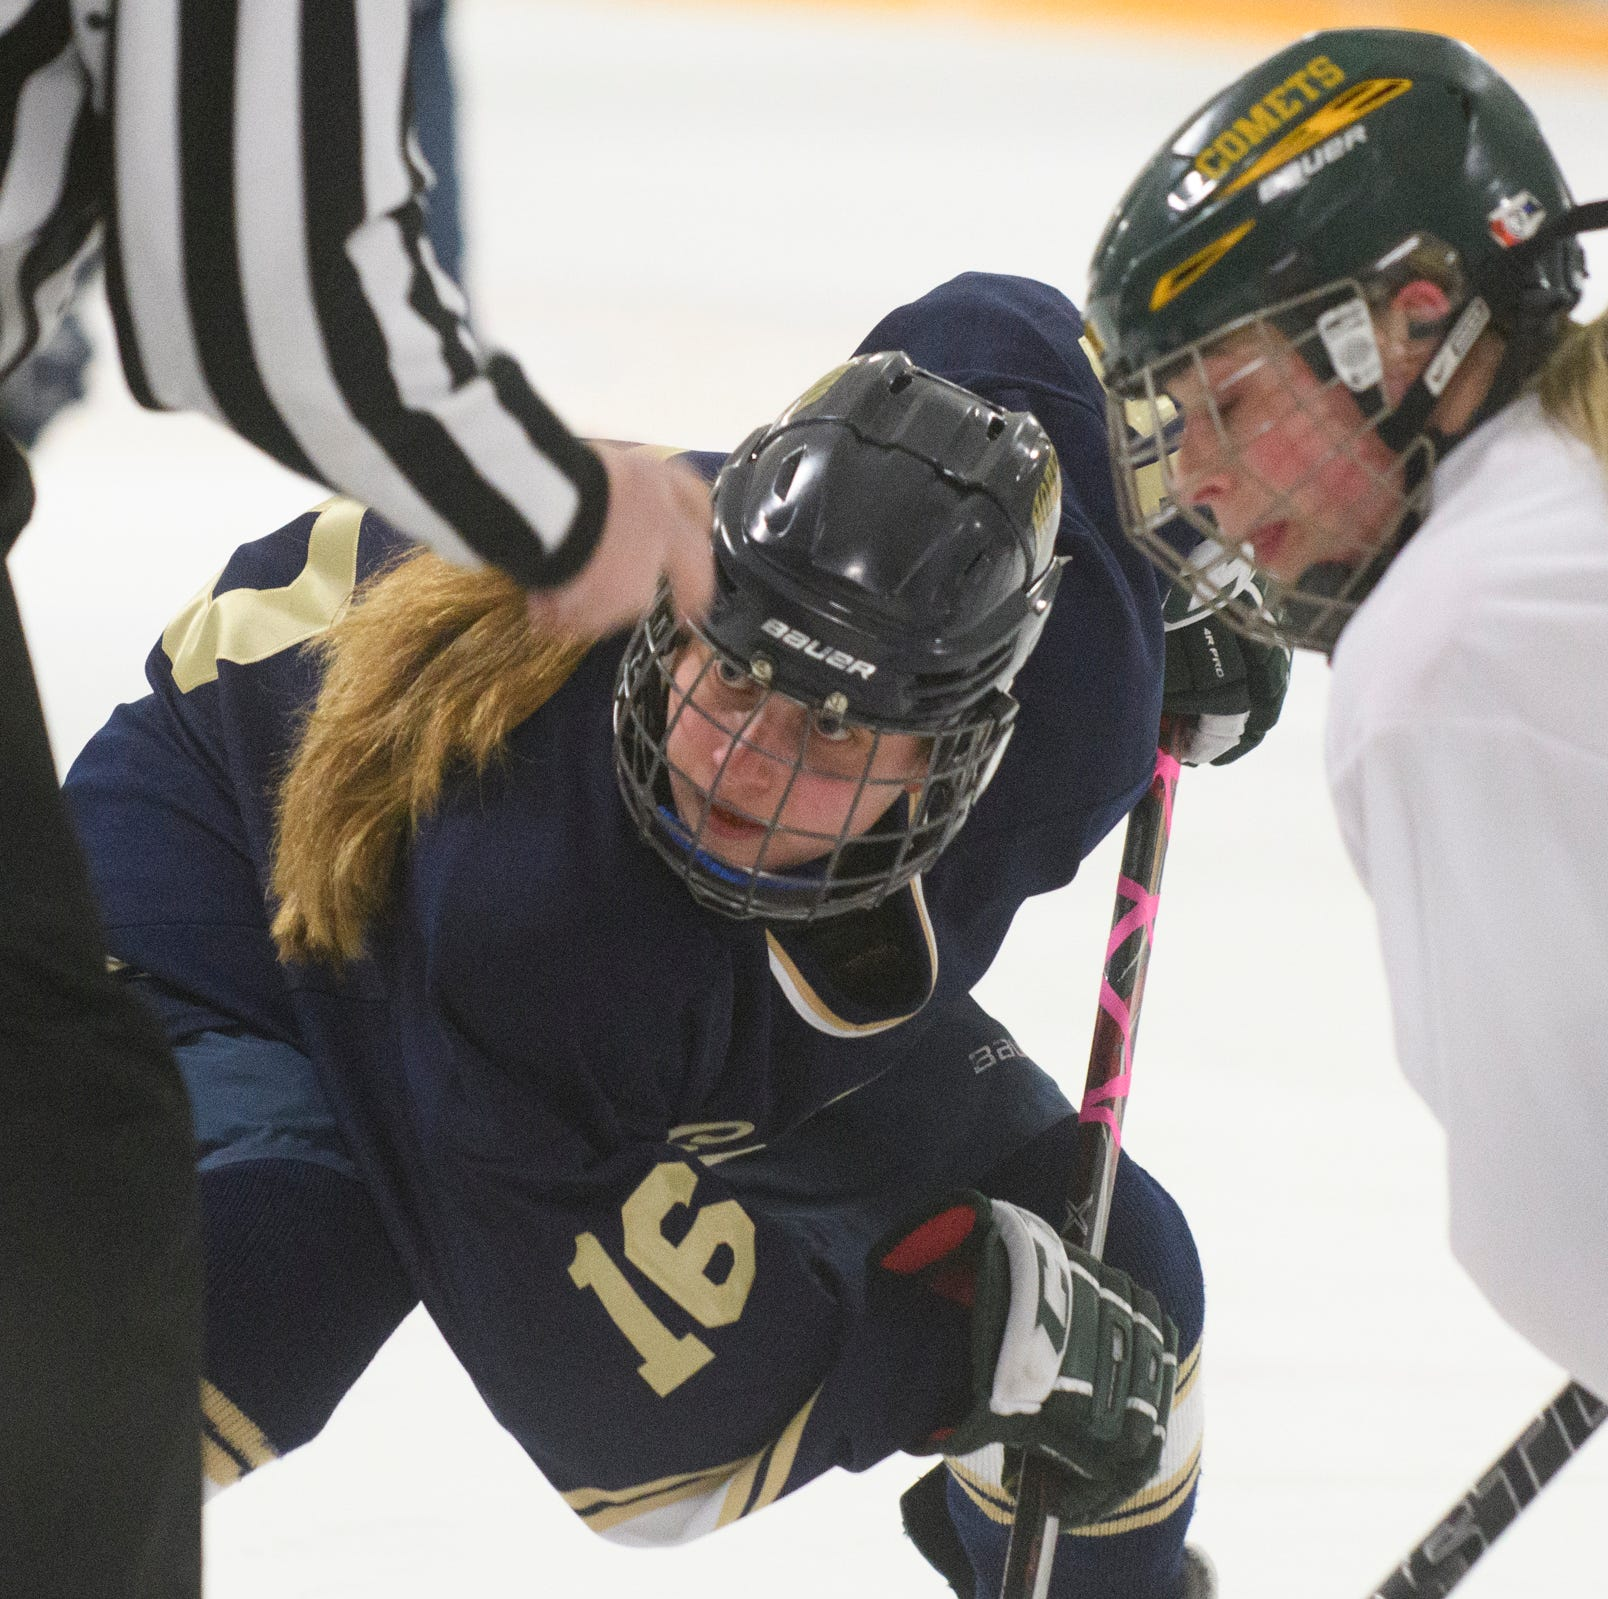 2019 Vermont high school girls hockey playoff primer and predictions